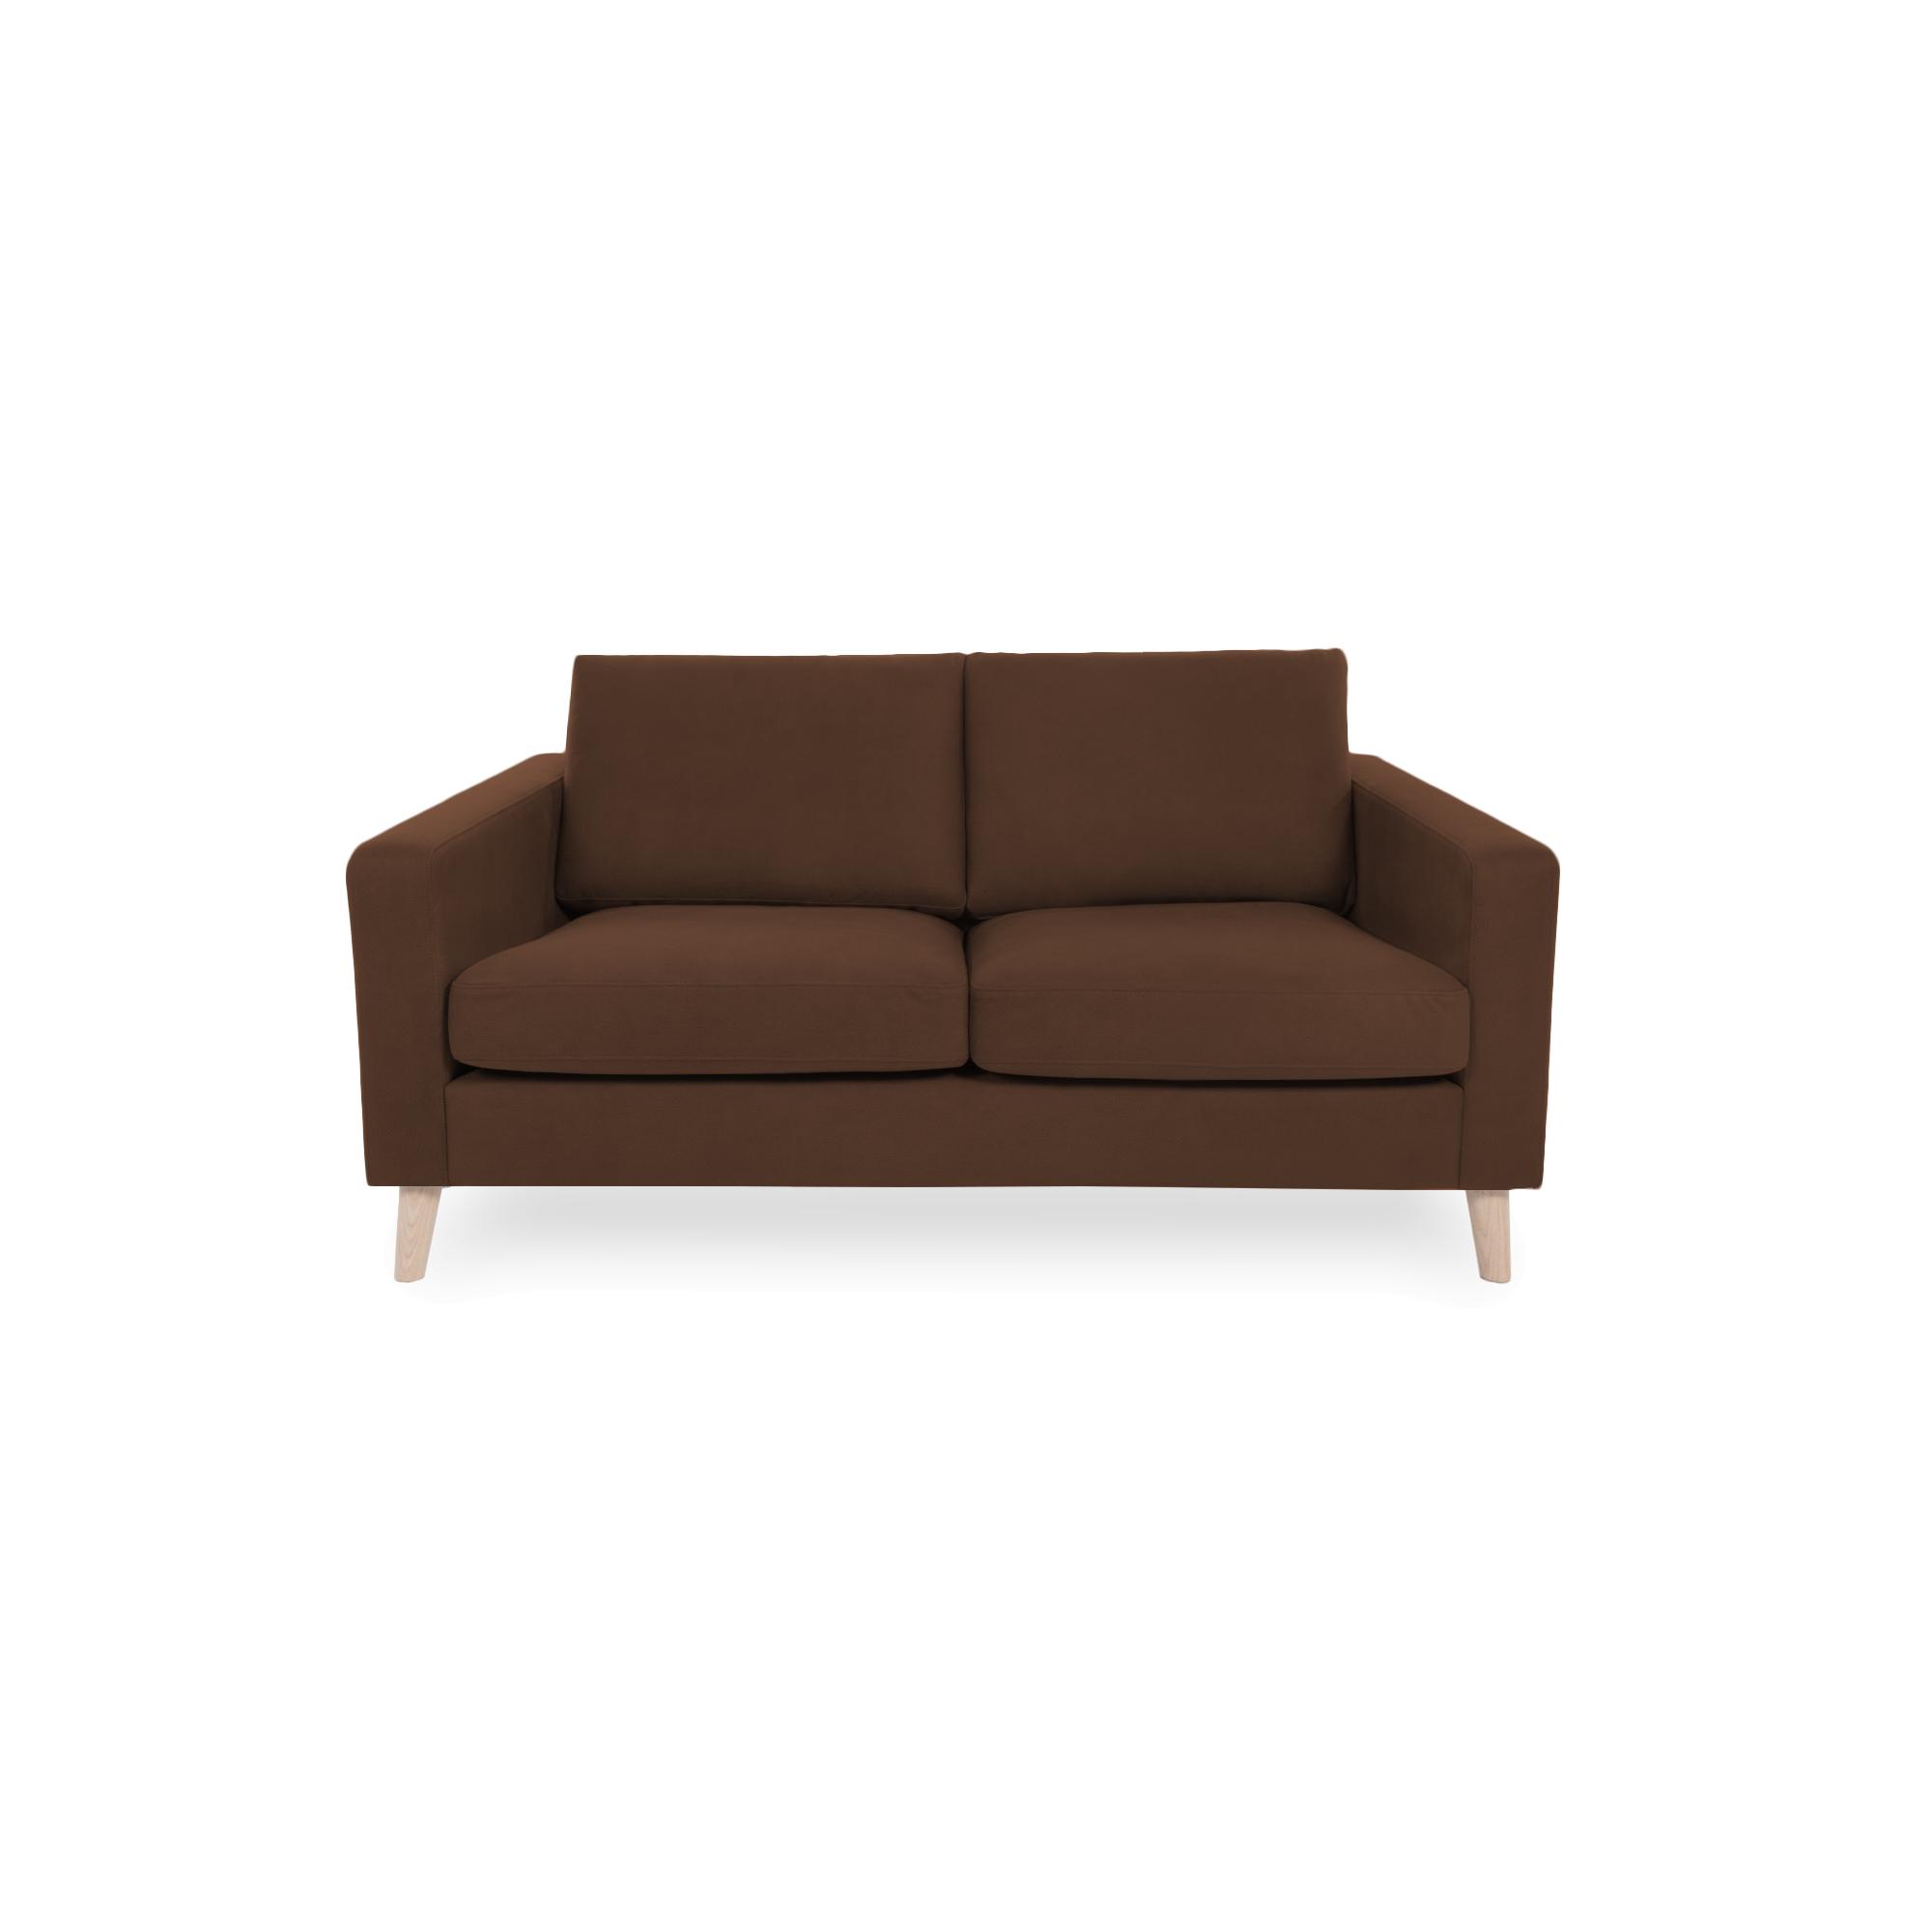 Canapea Fixa 2 locuri Tom Cognac/Natural